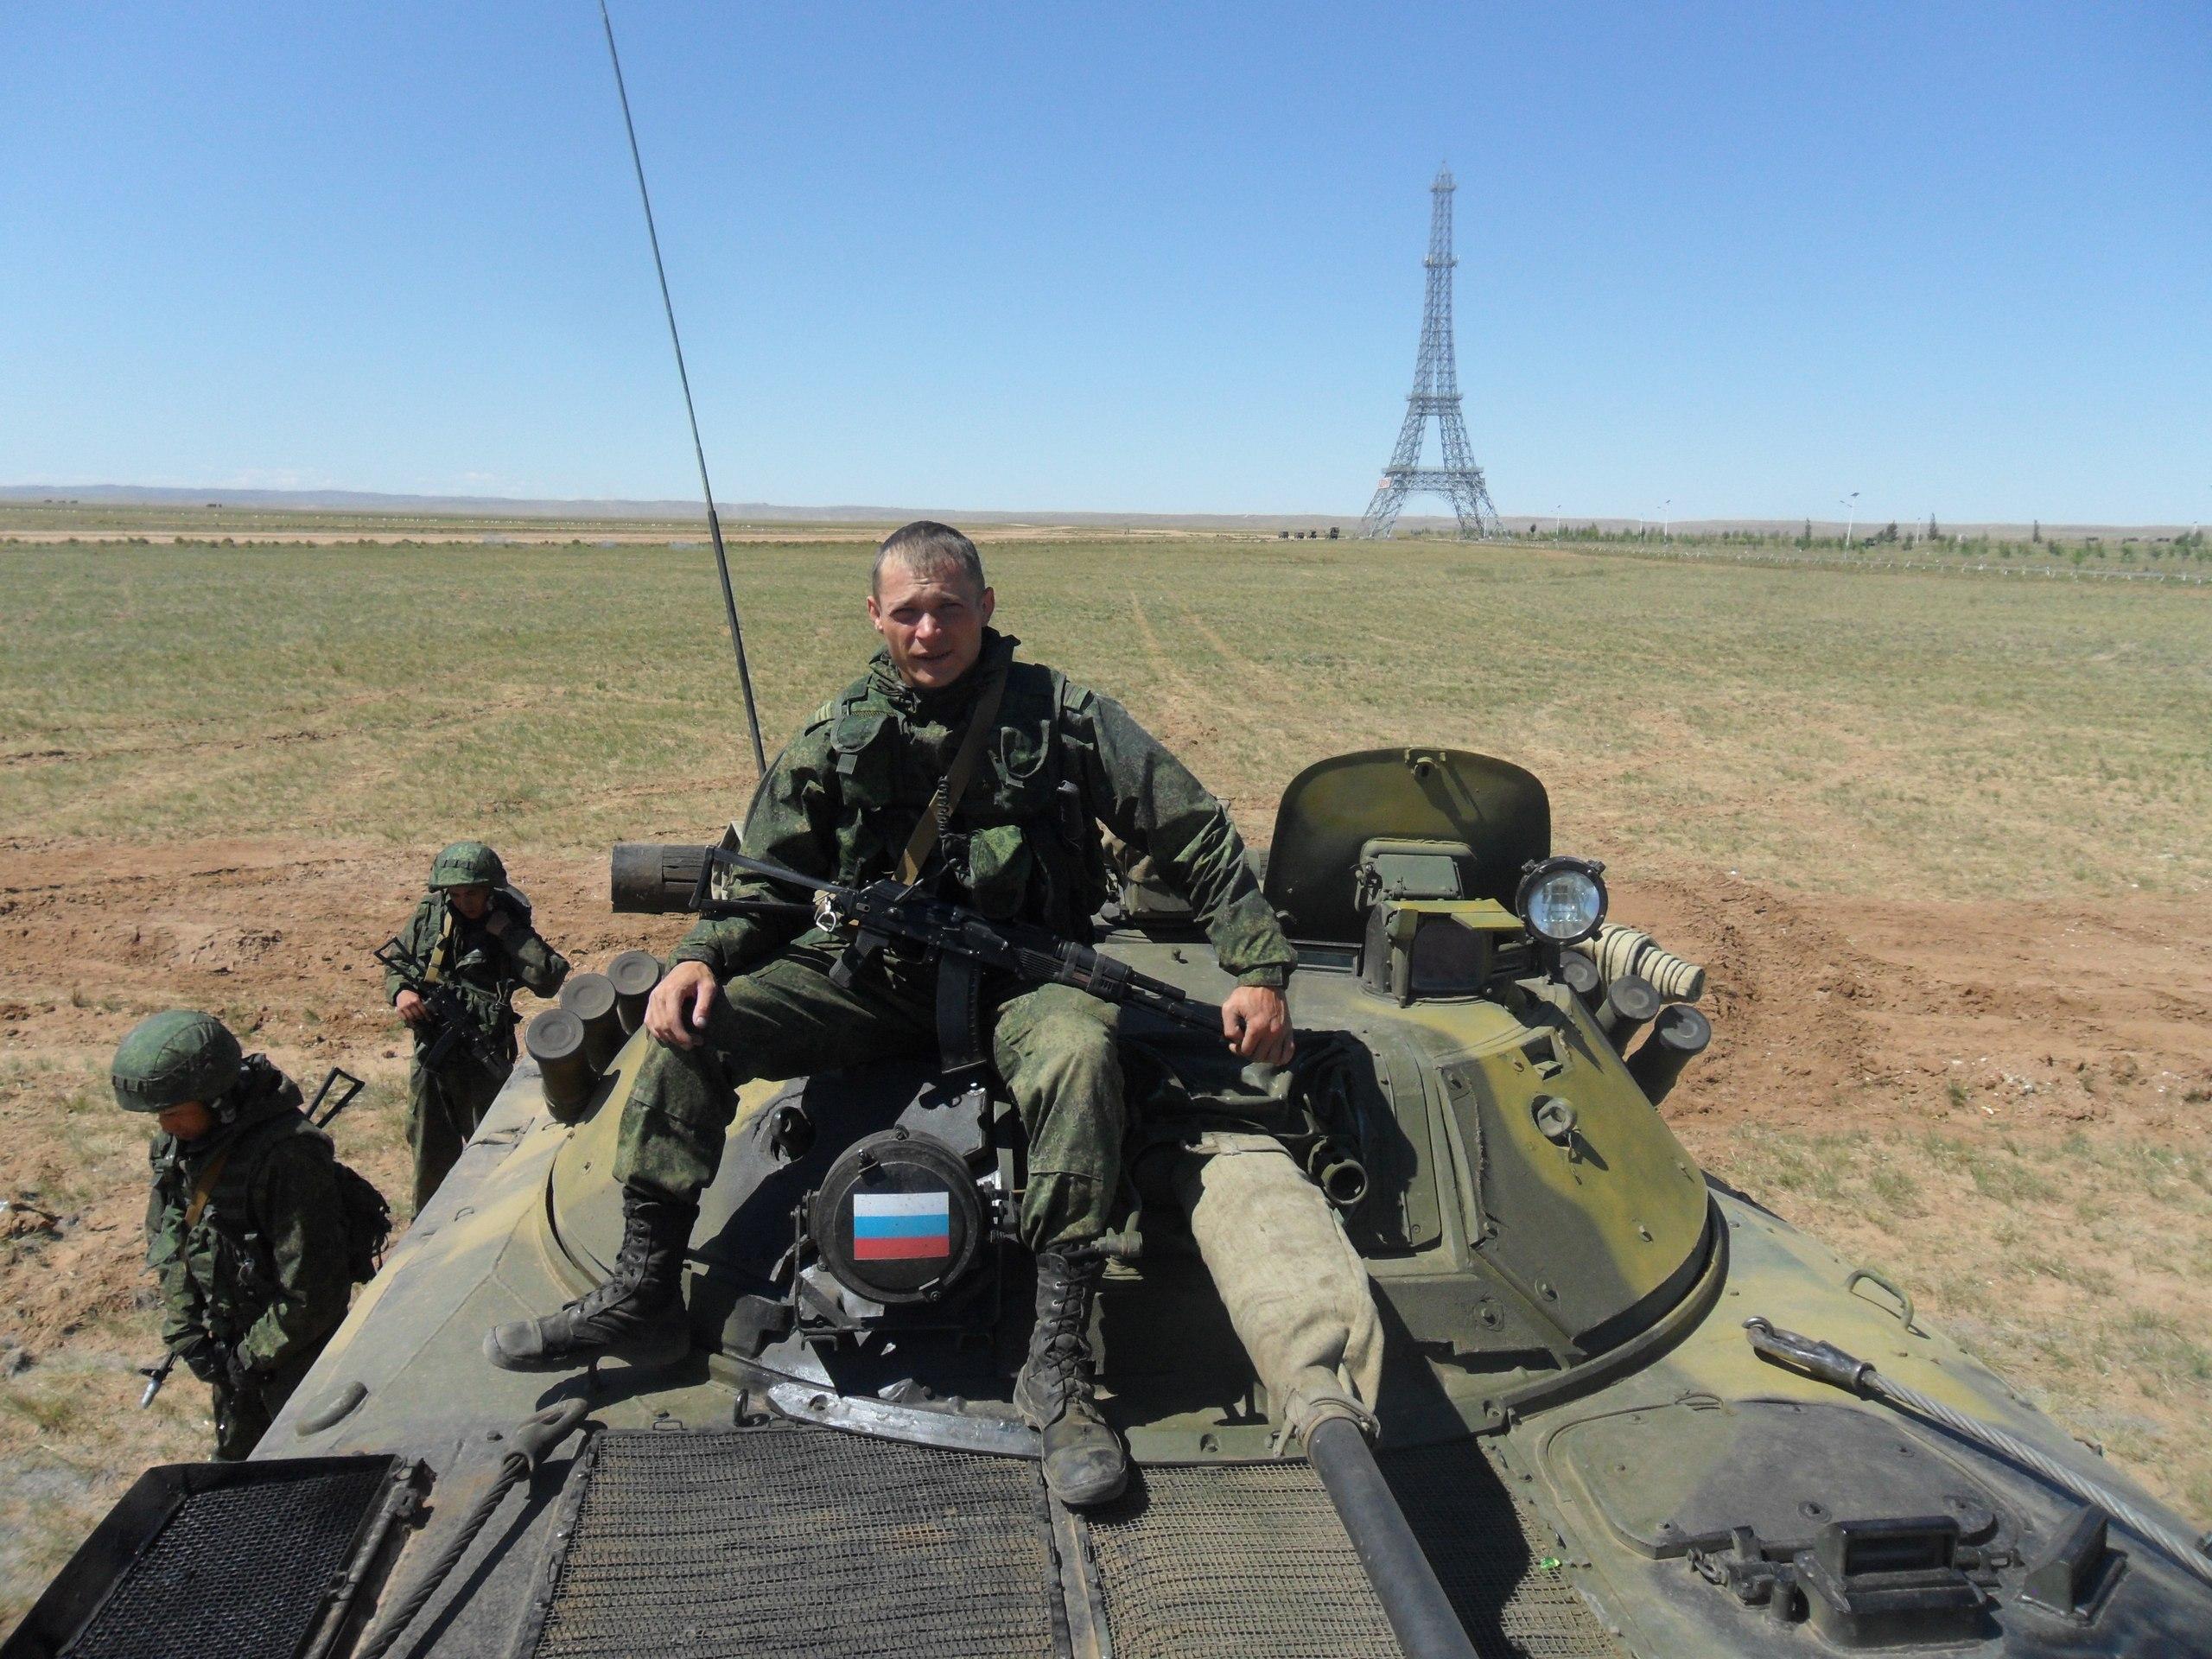 Russian Military Photos and Videos #2 - Page 33 Qma-HU1hdN8